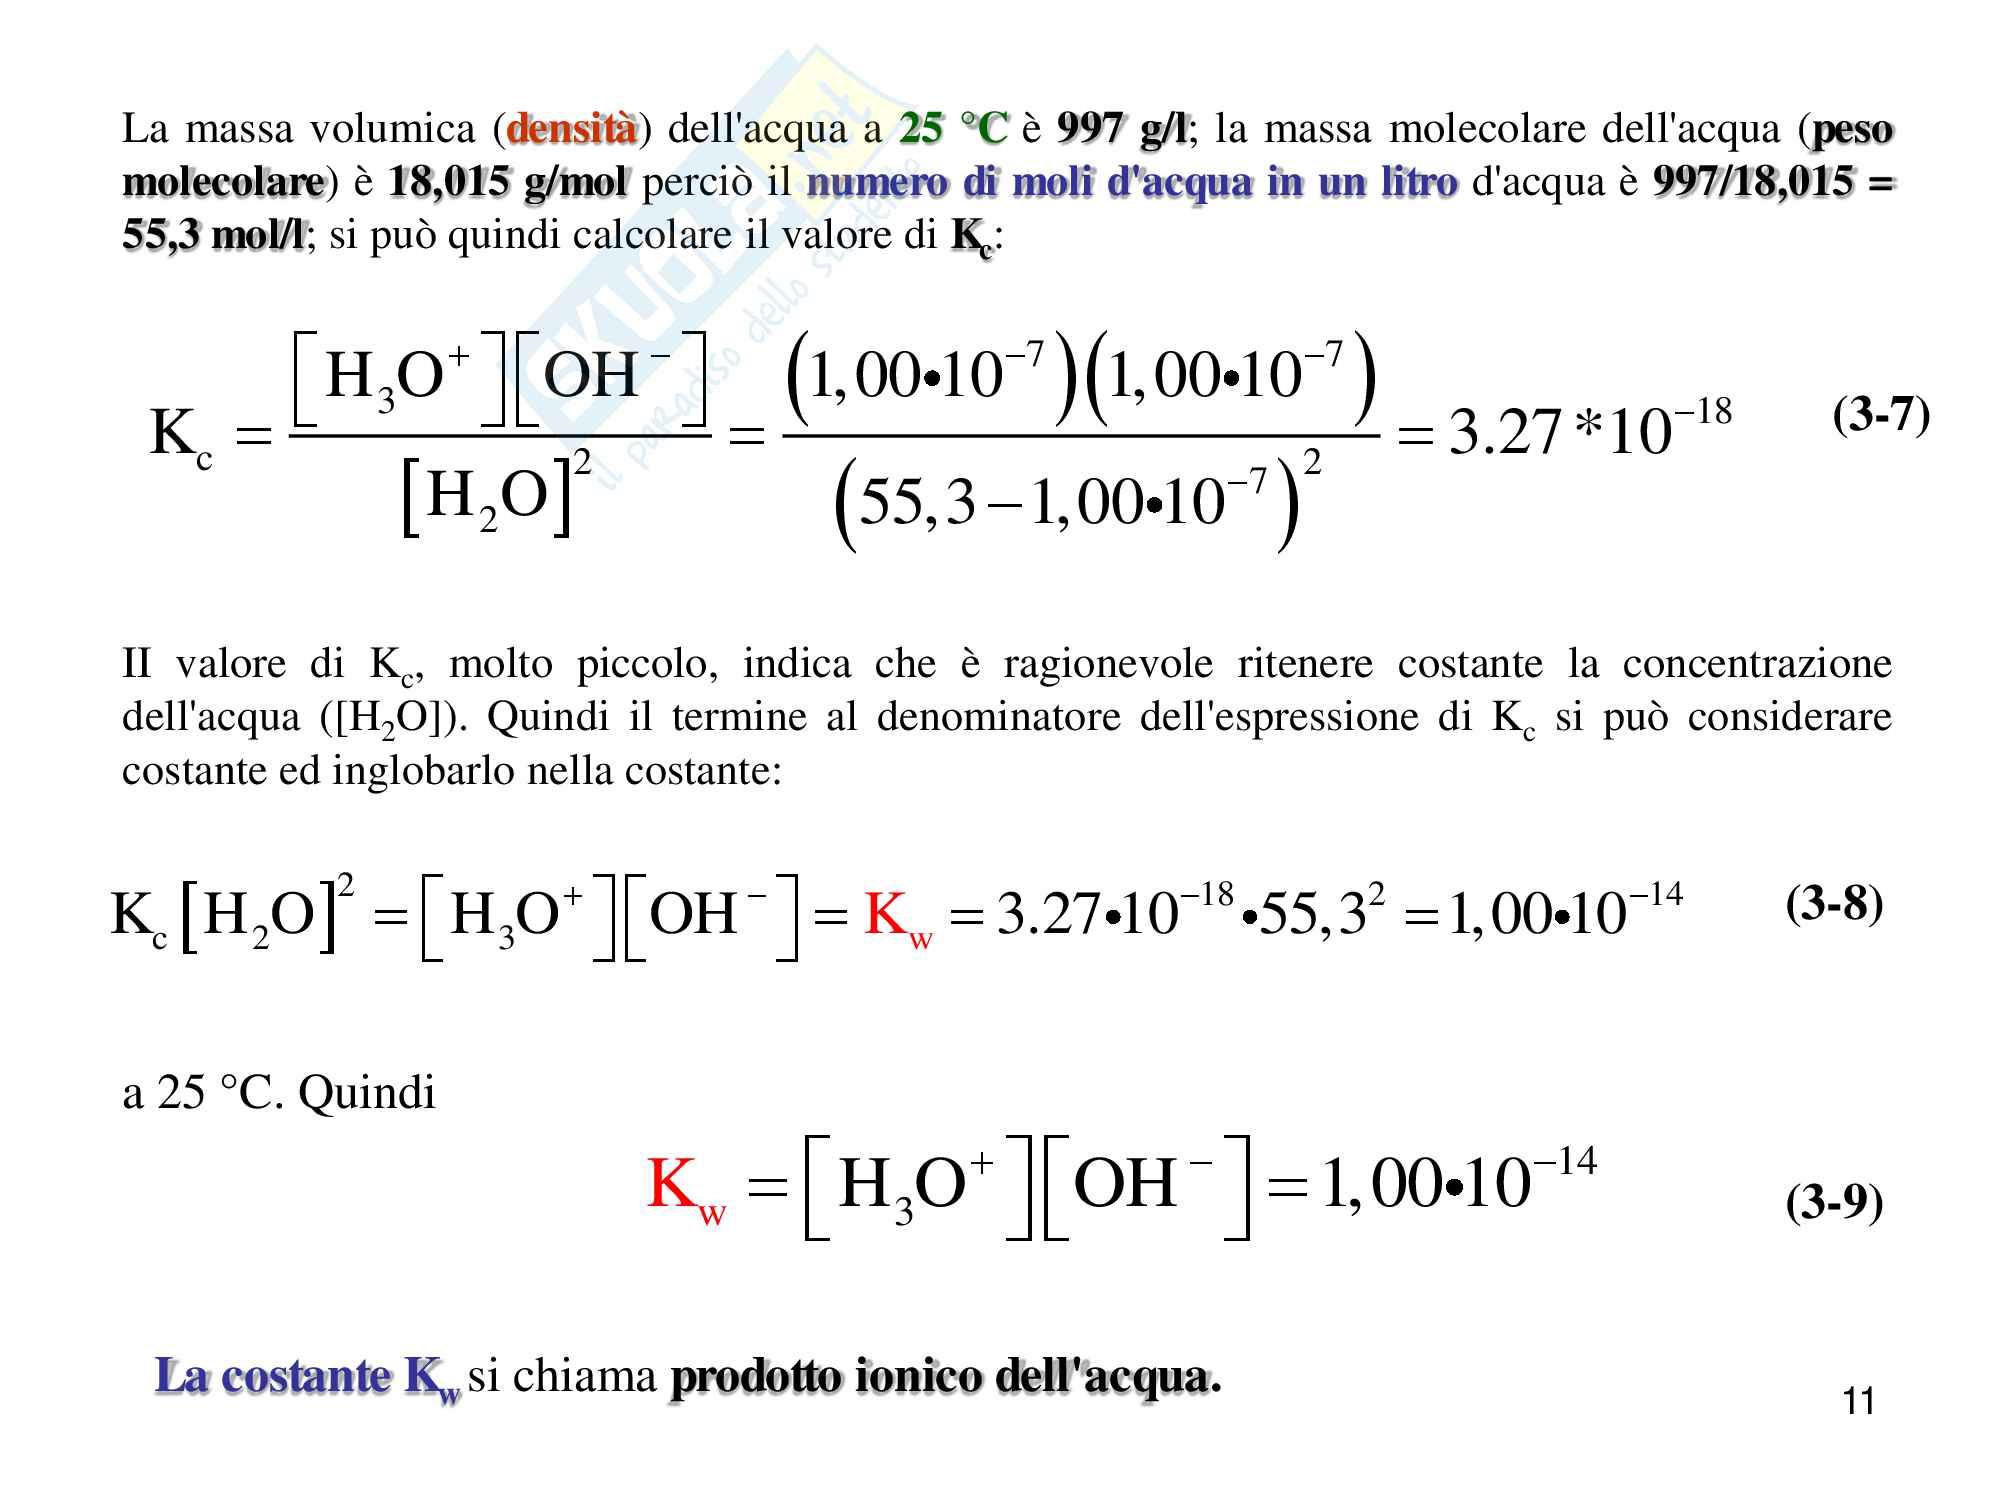 Chimica analitica, equilibrio acido base Pag. 11